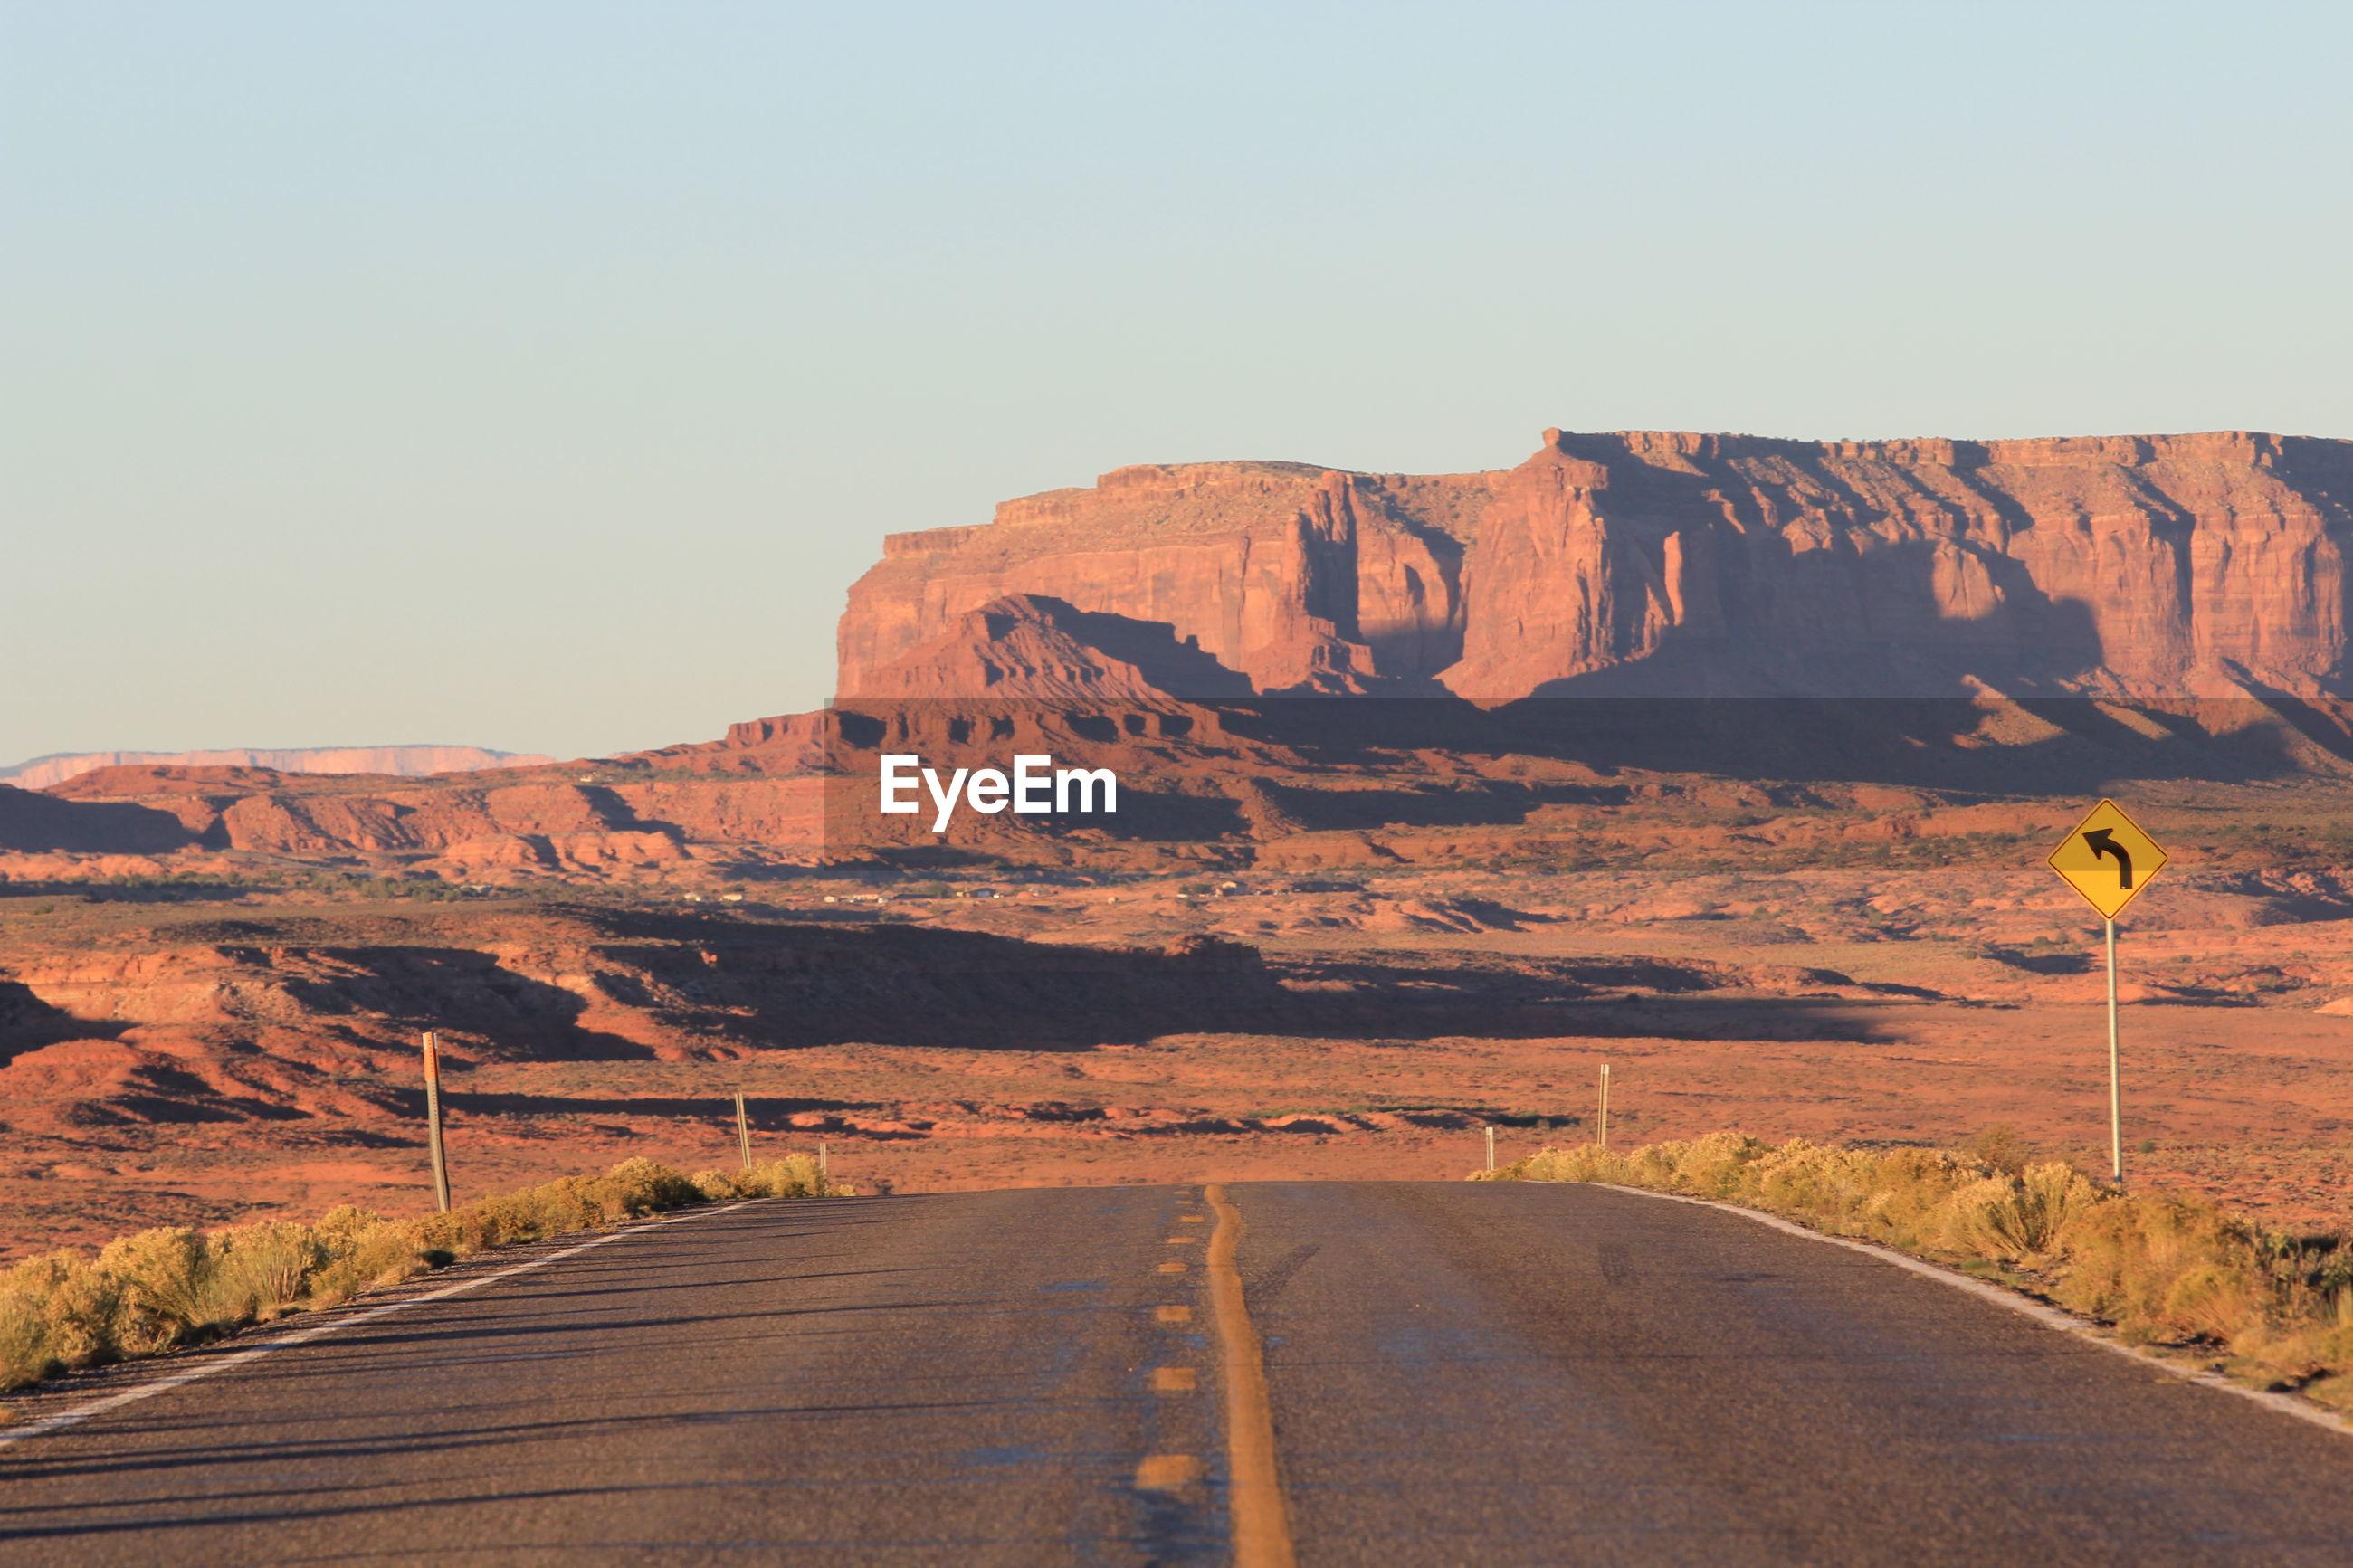 Empty road passing through mountain